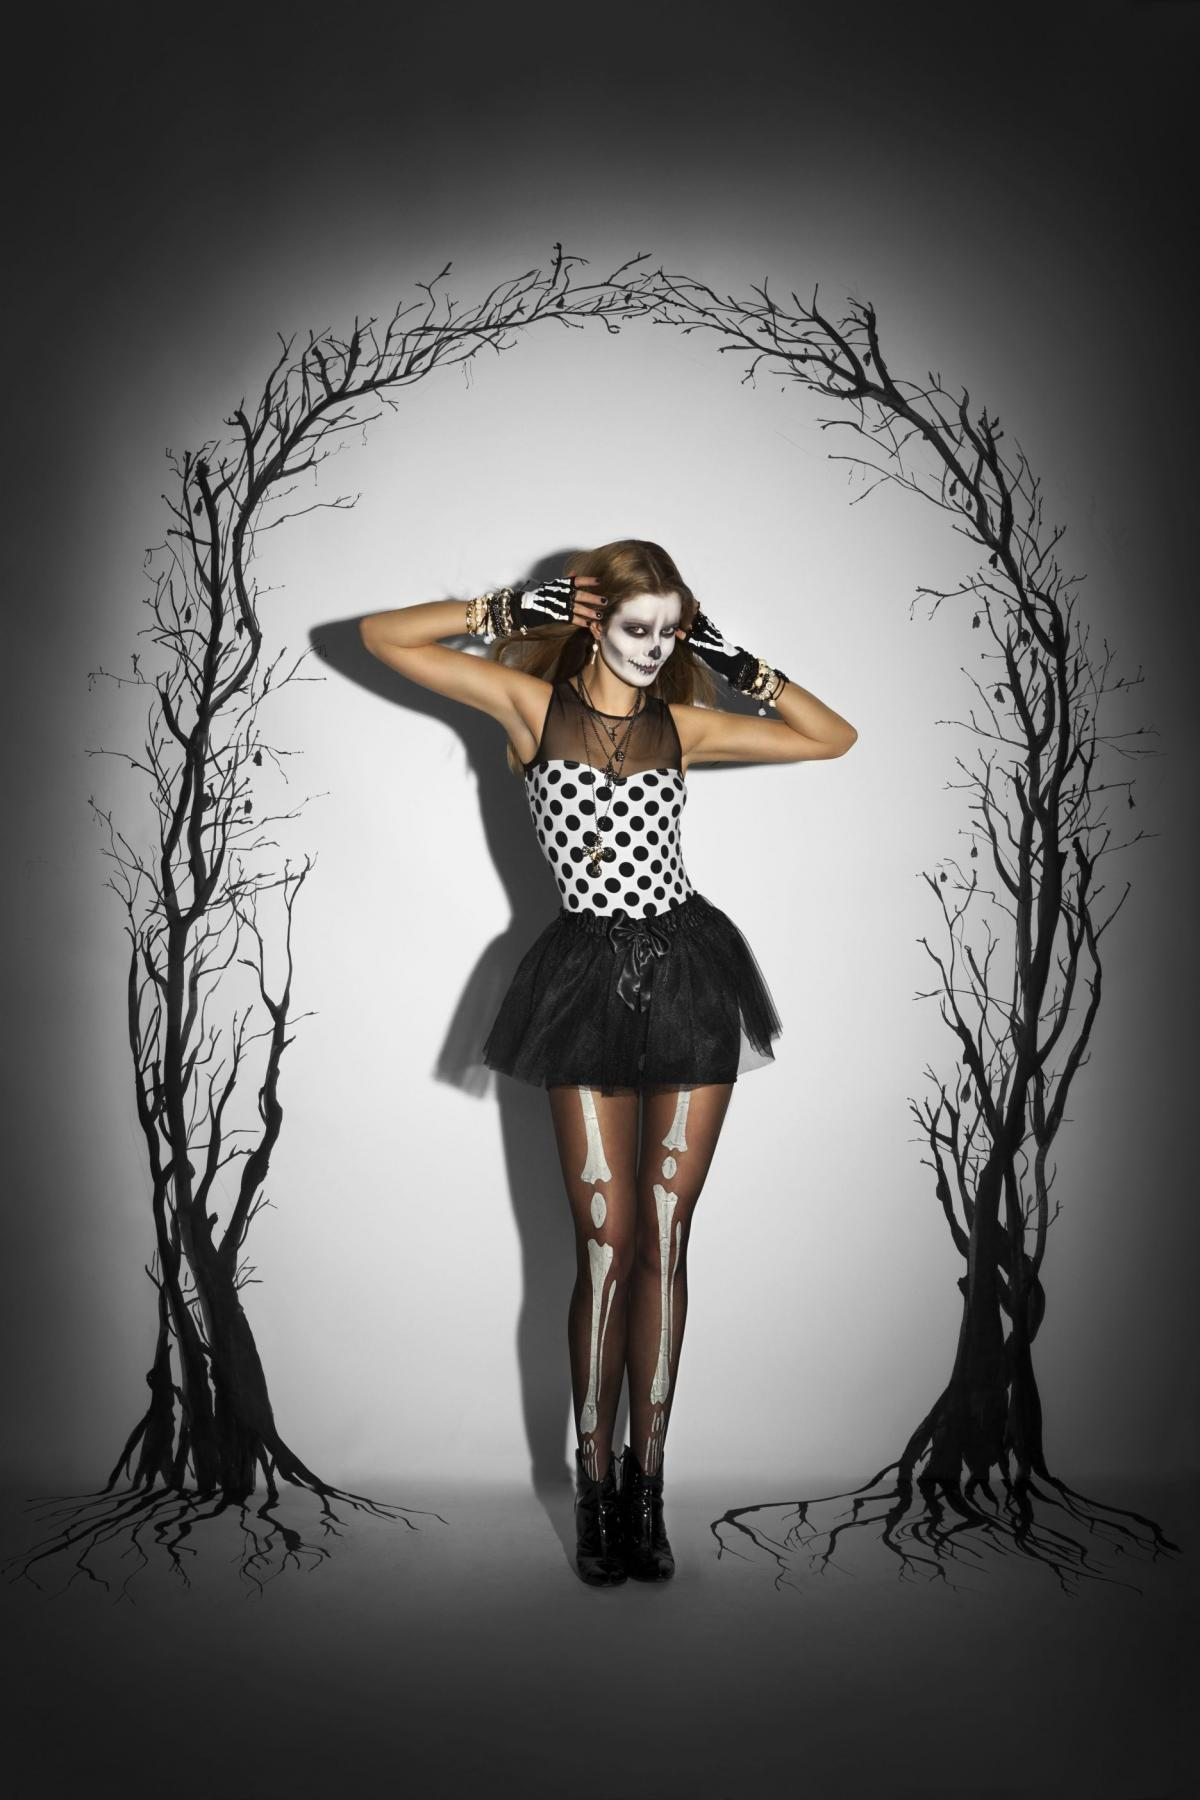 Halloweenowe kostiumy i dodatki 2012